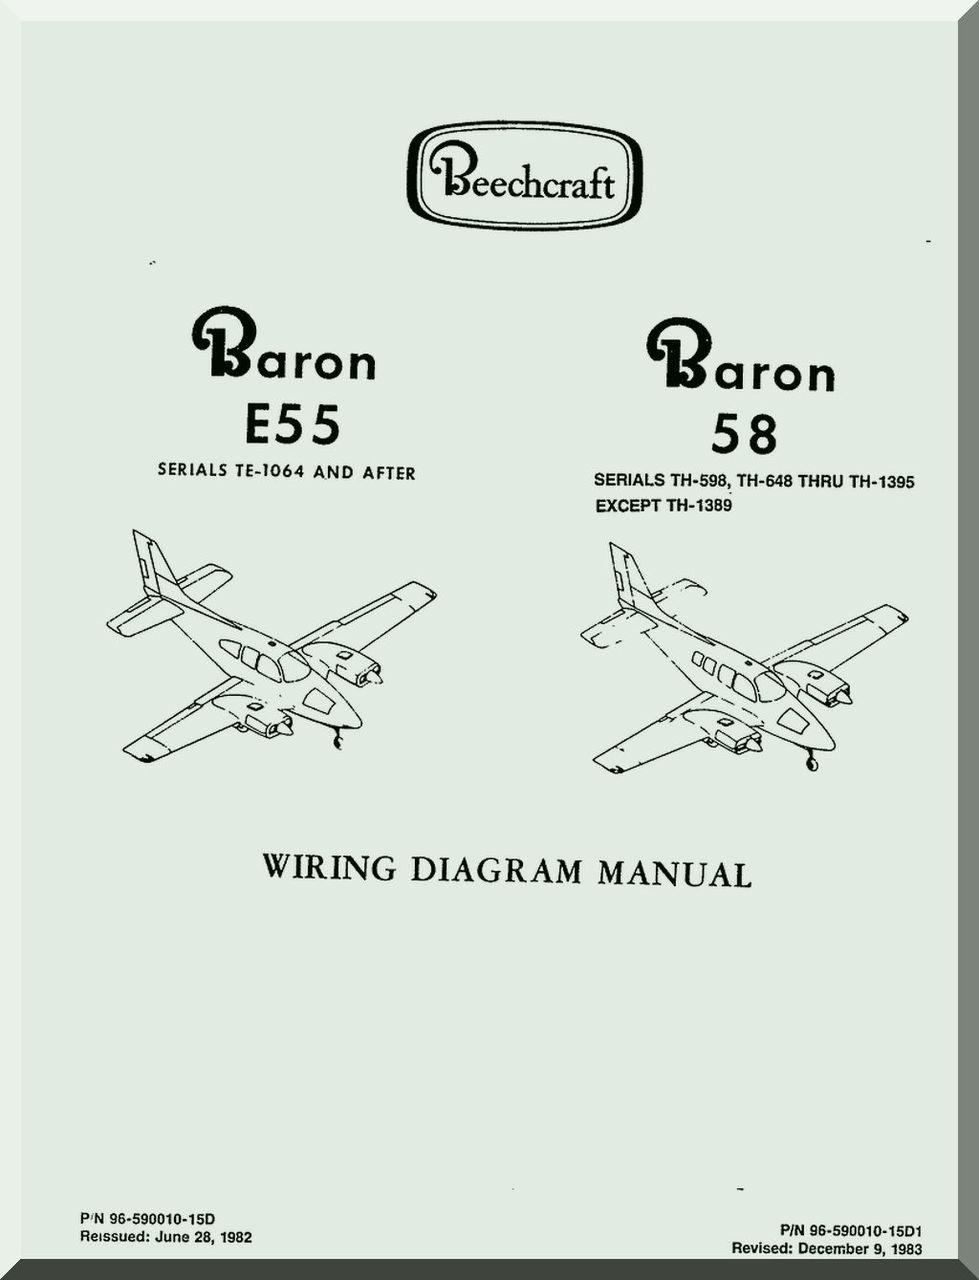 hight resolution of wiring diagram manual aircraft beechcraft baron e 55 58 aircraft wiring diagram manual